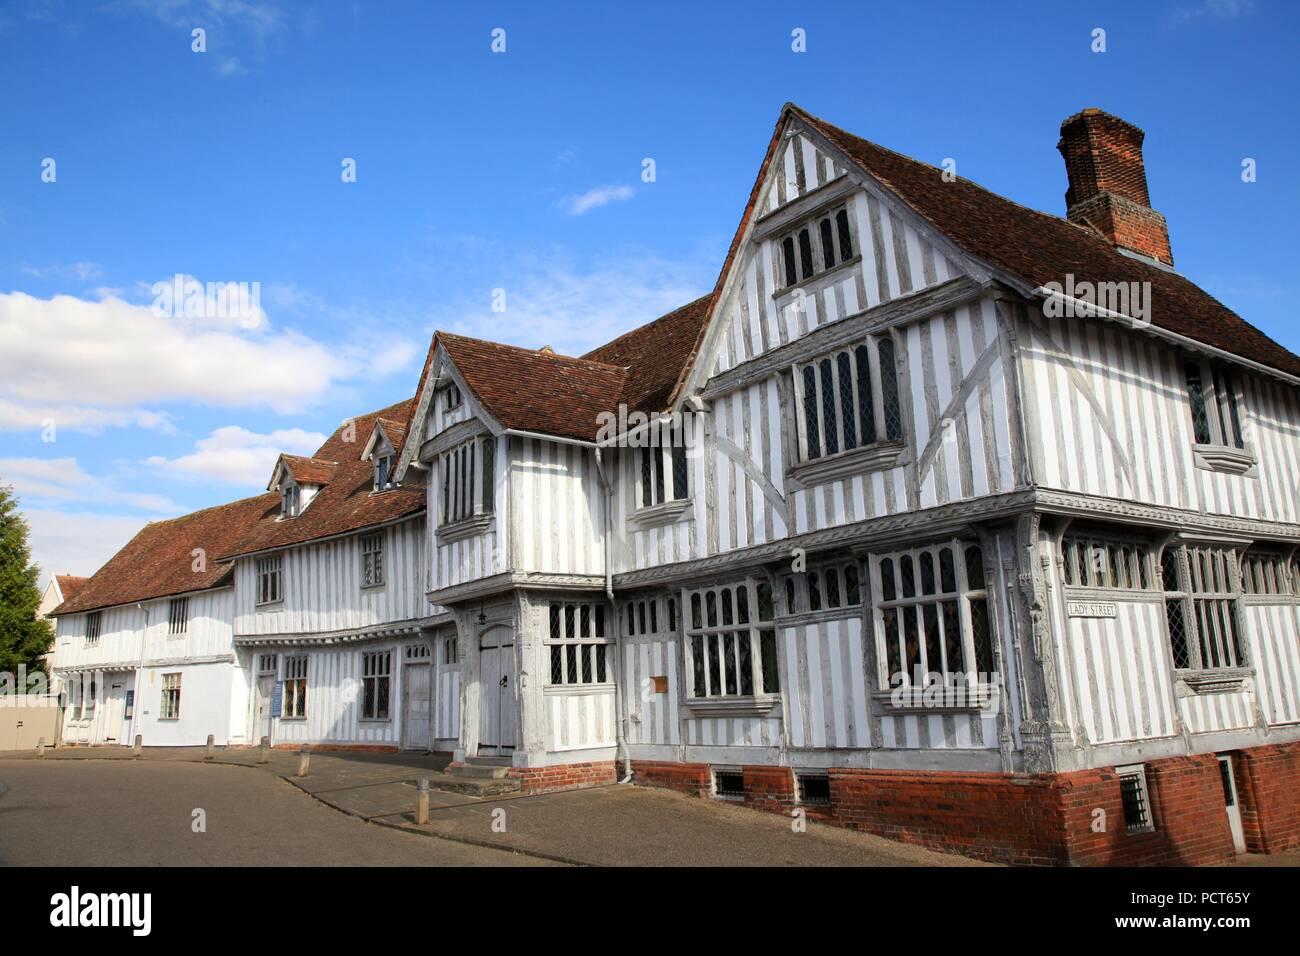 Guildhall of Corpus Christi Lavenham Suffolk UK - Stock Image